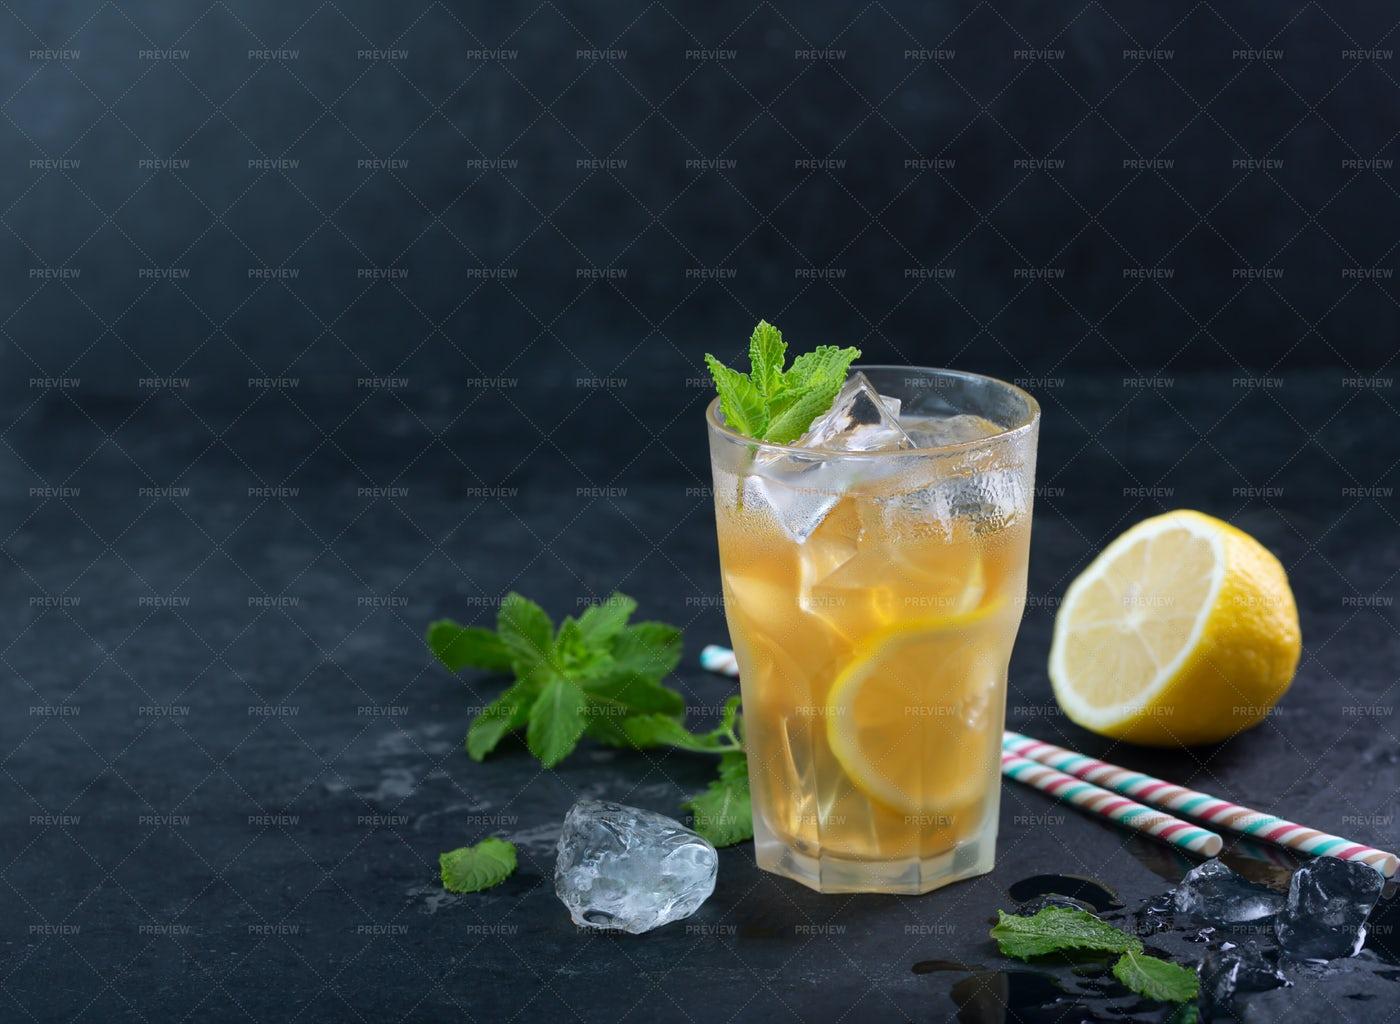 Lemon Ice Tea Background: Stock Photos